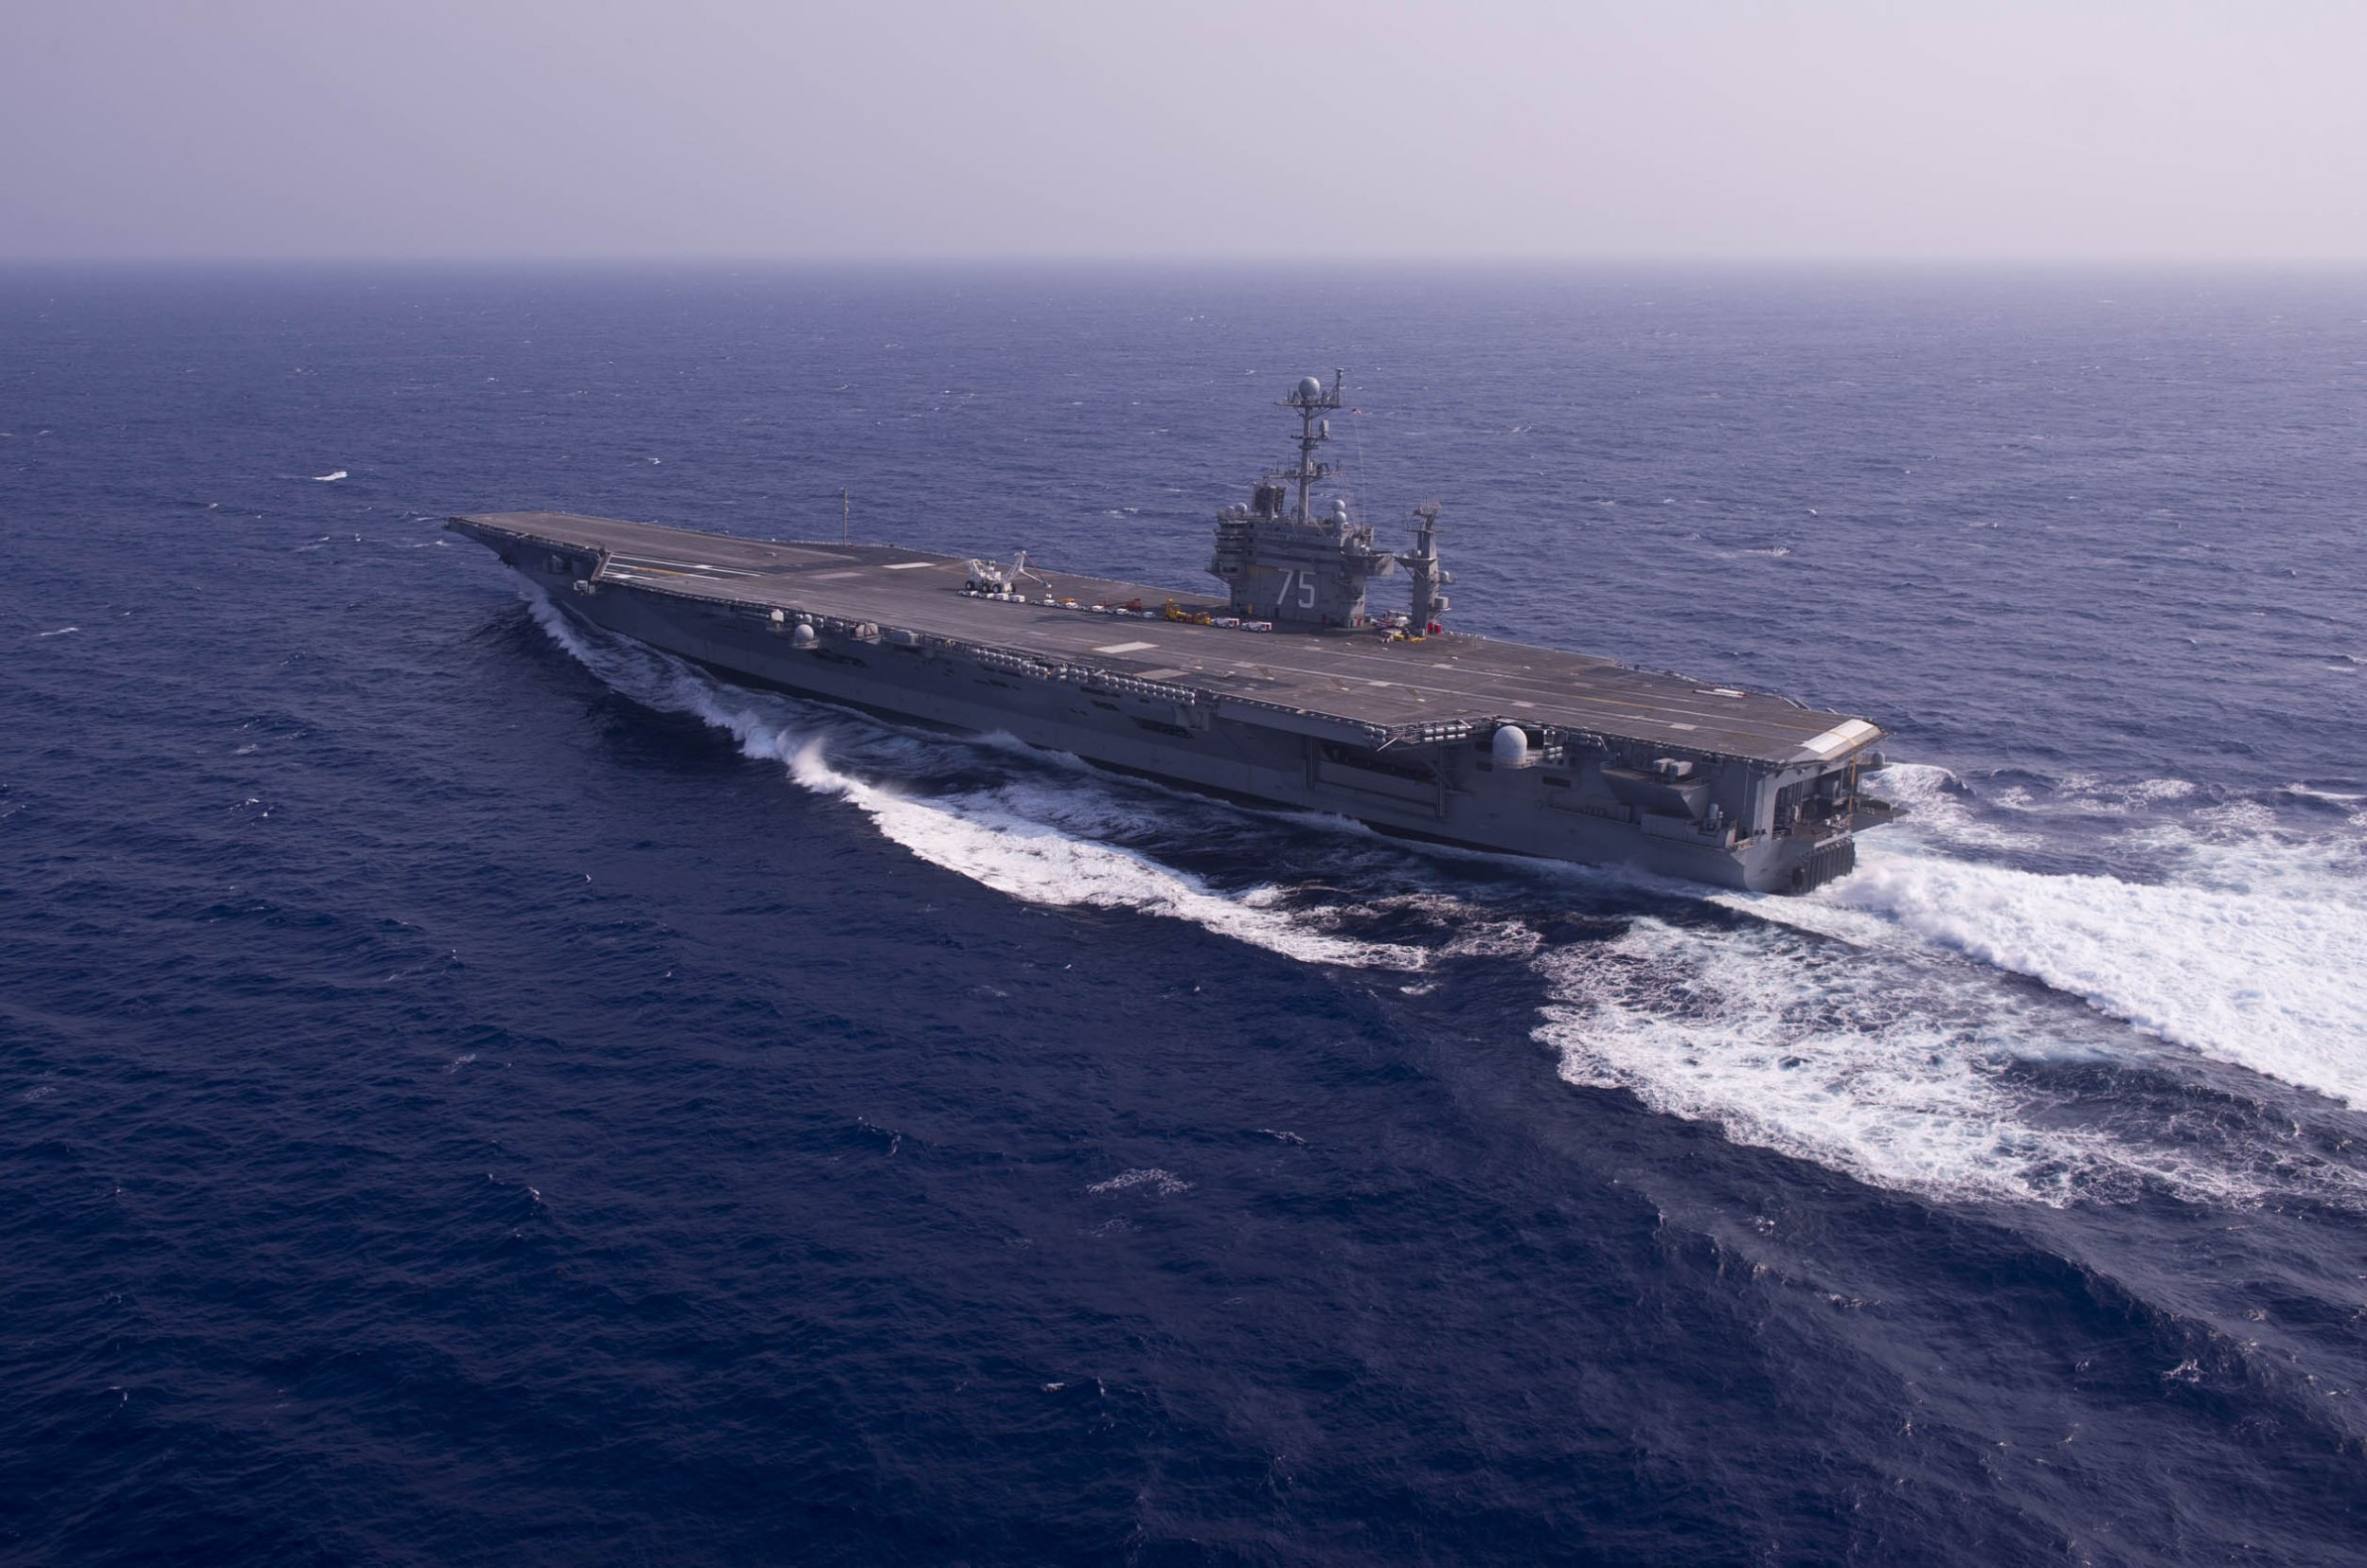 Iran fires missiles near USS Harry S. Truman